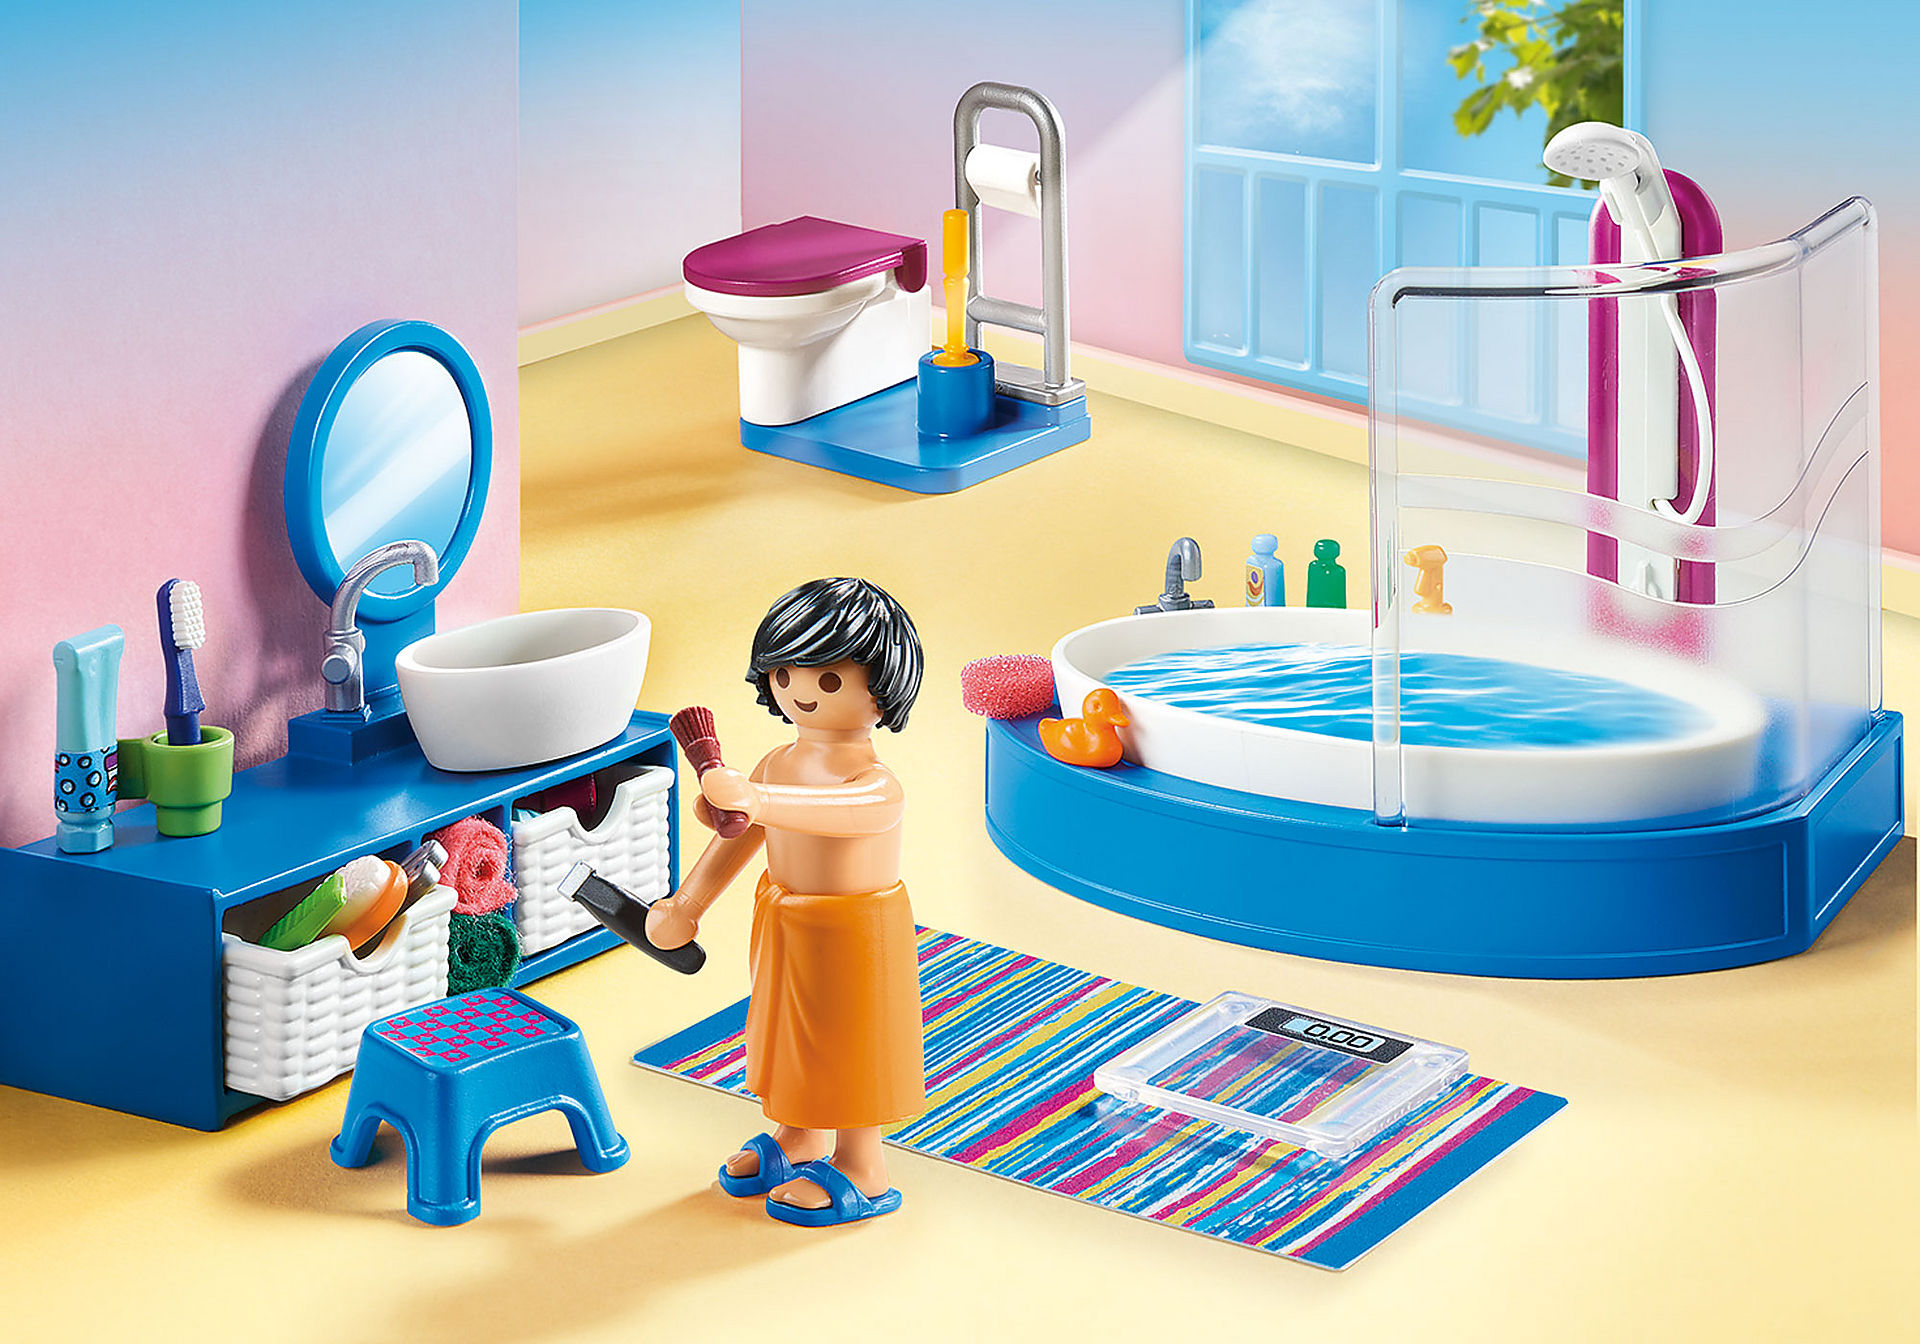 70211 Bathroom with Tub zoom image1